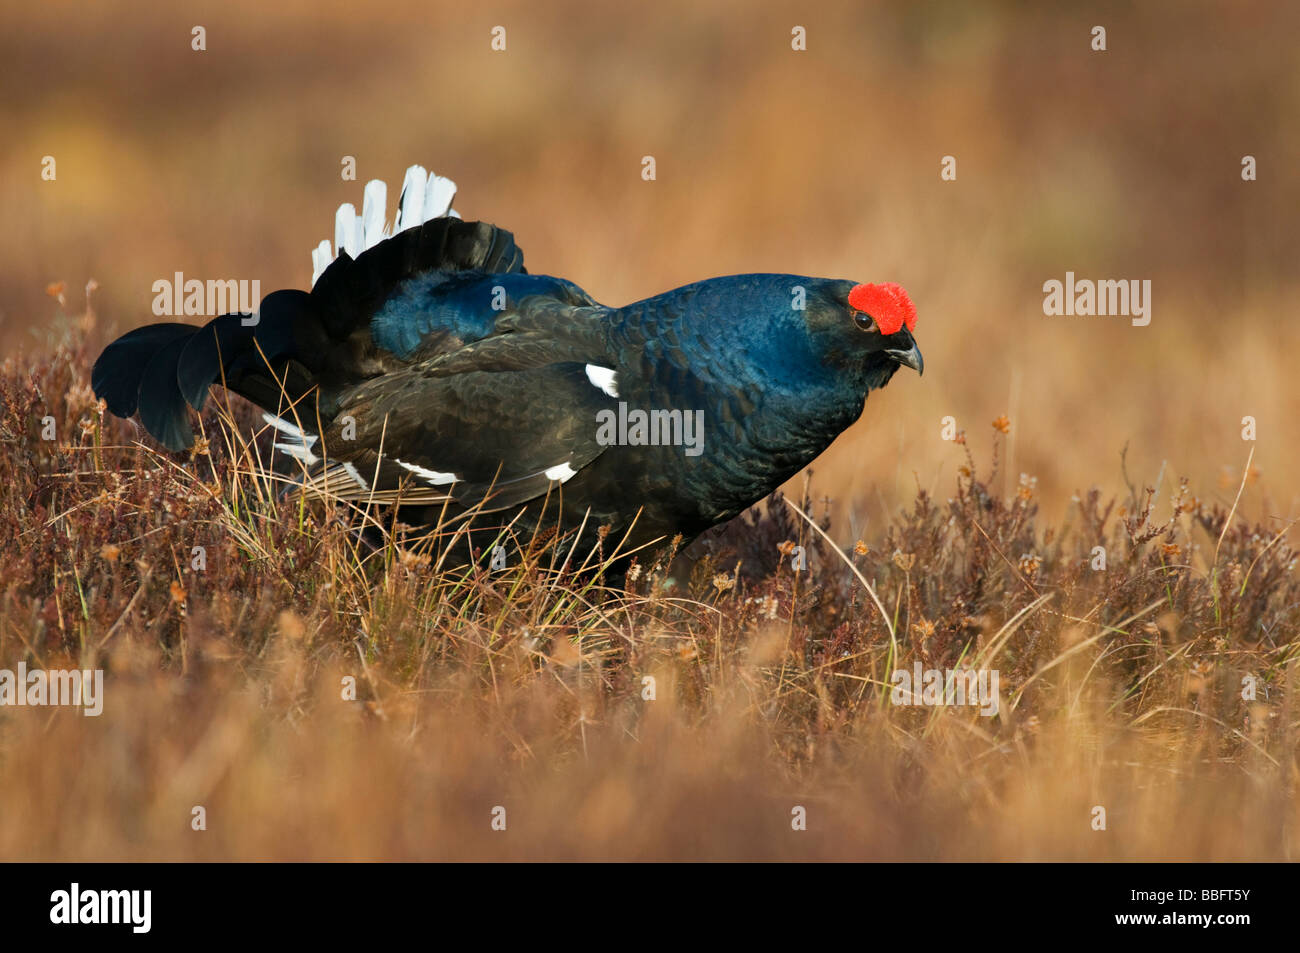 Black Grouse or Blackgame (Lyrurus tetrix or Tetrao tetrix), male or blackcock in a courtship display in a Swedish Stock Photo